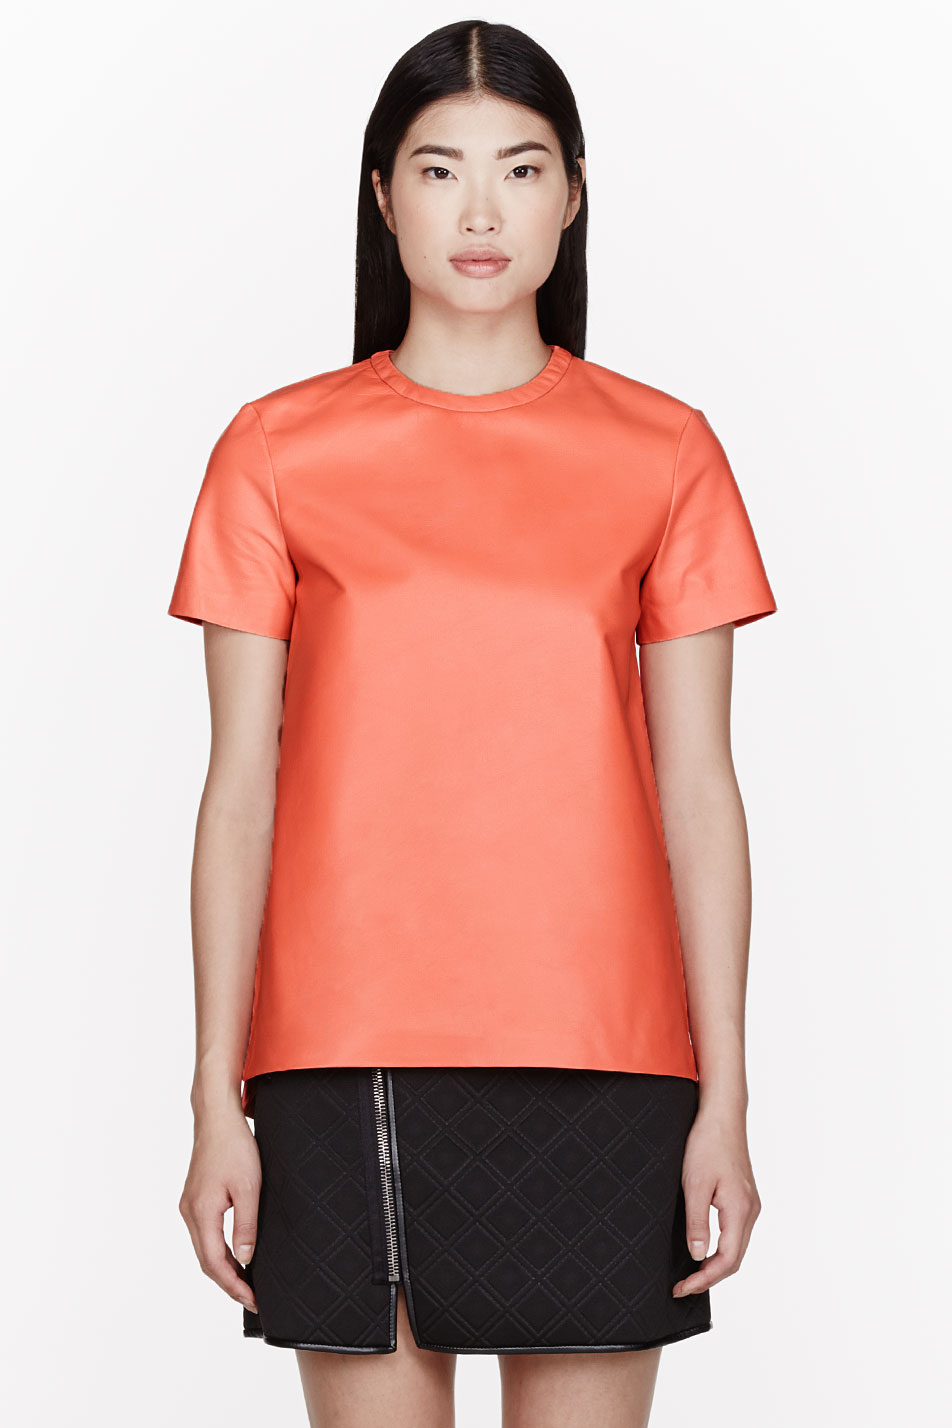 proenza schouler coral orange leather tissue t_shirt